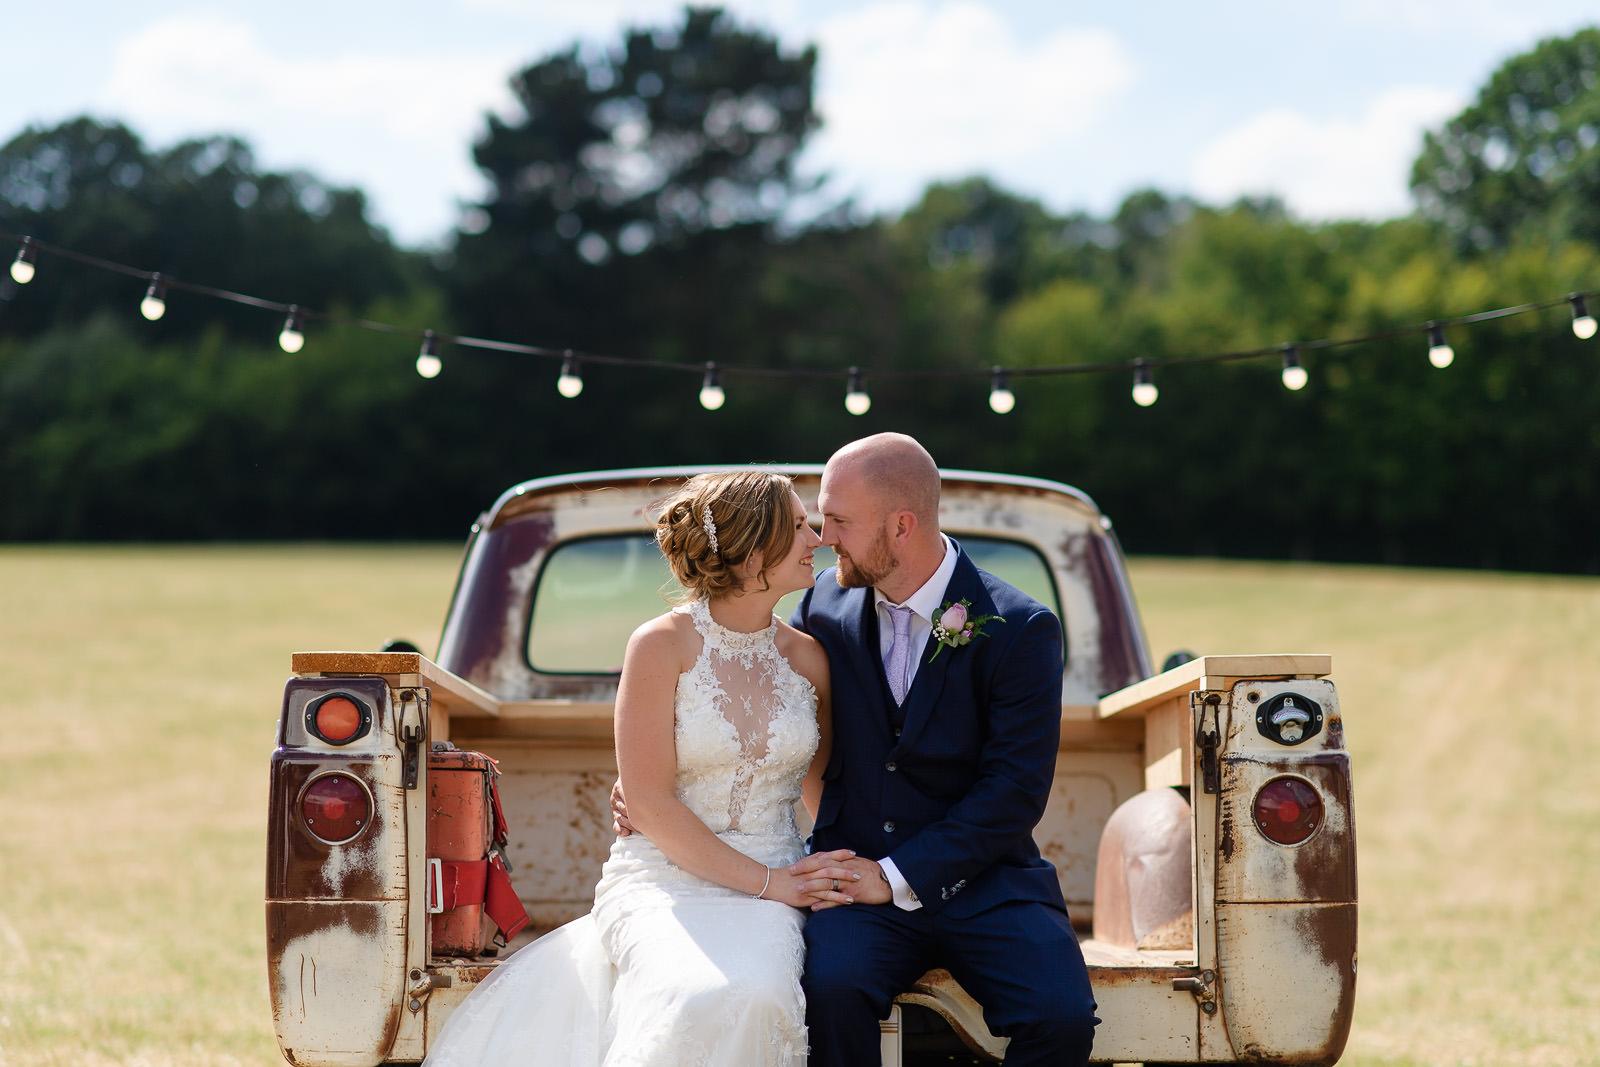 festival wedding photograph in hertfordshire